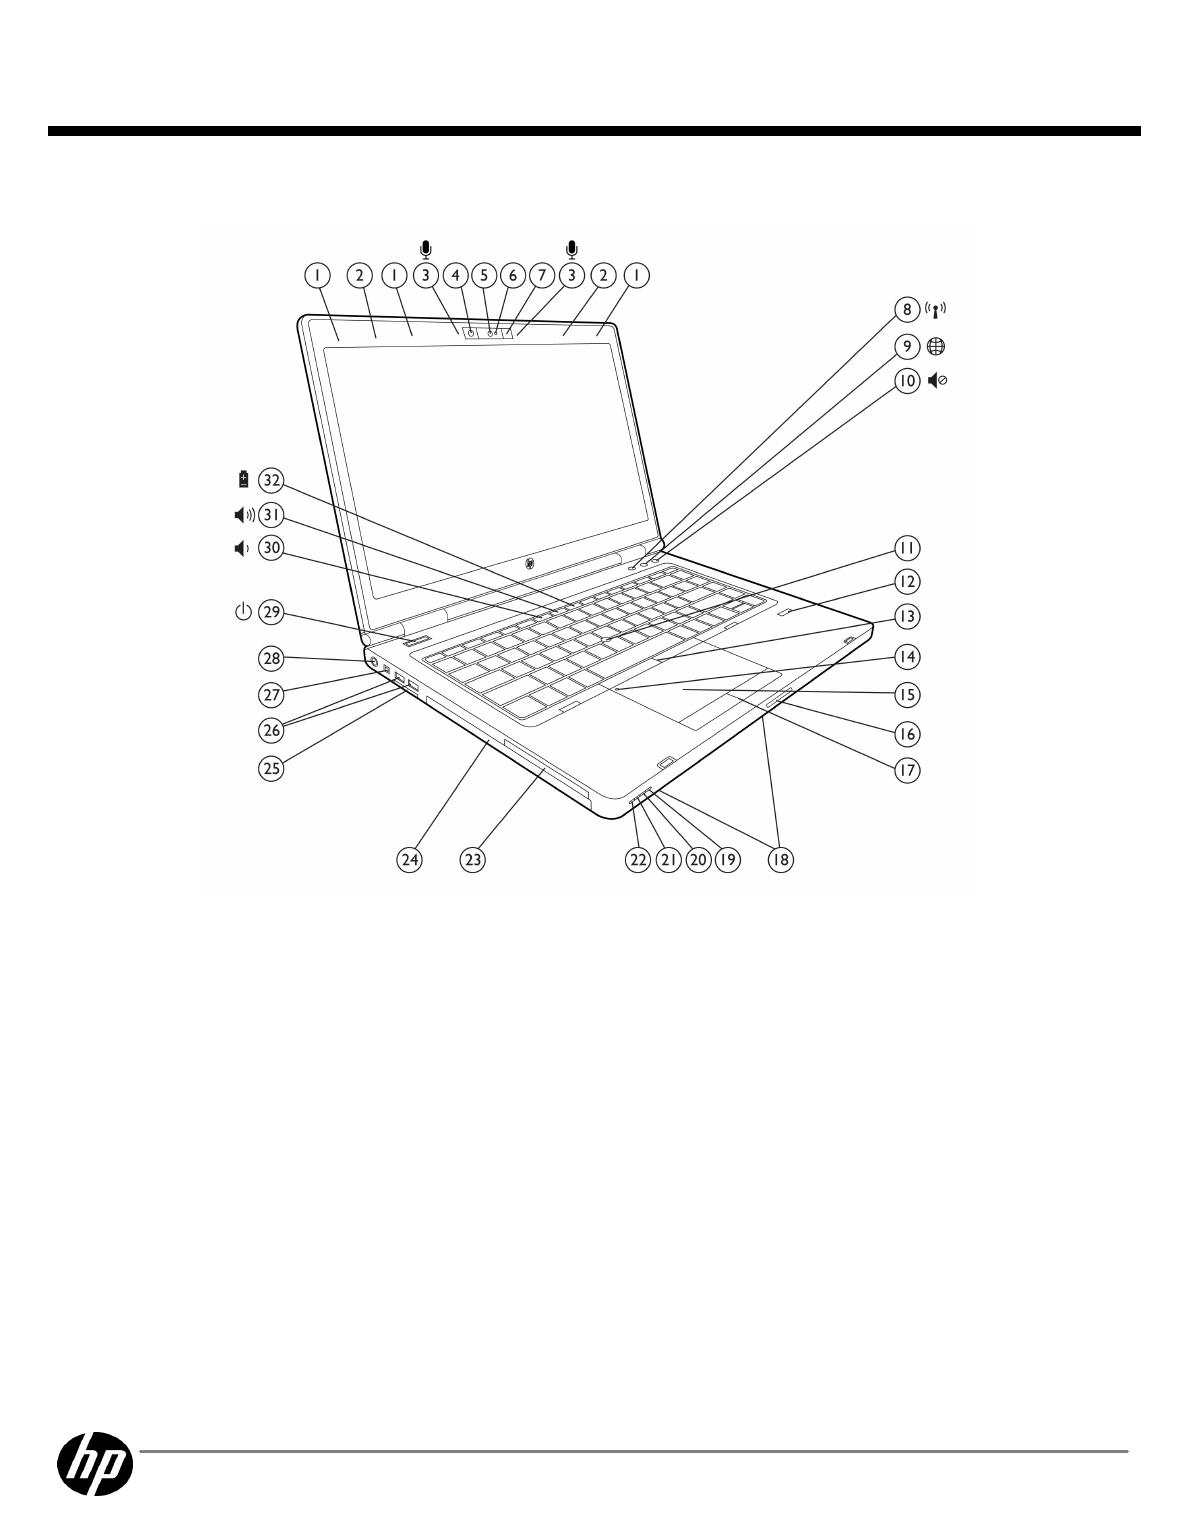 💄 Hp elitebook 8460p hotkey driver windows 10 | Elitebook 8460p